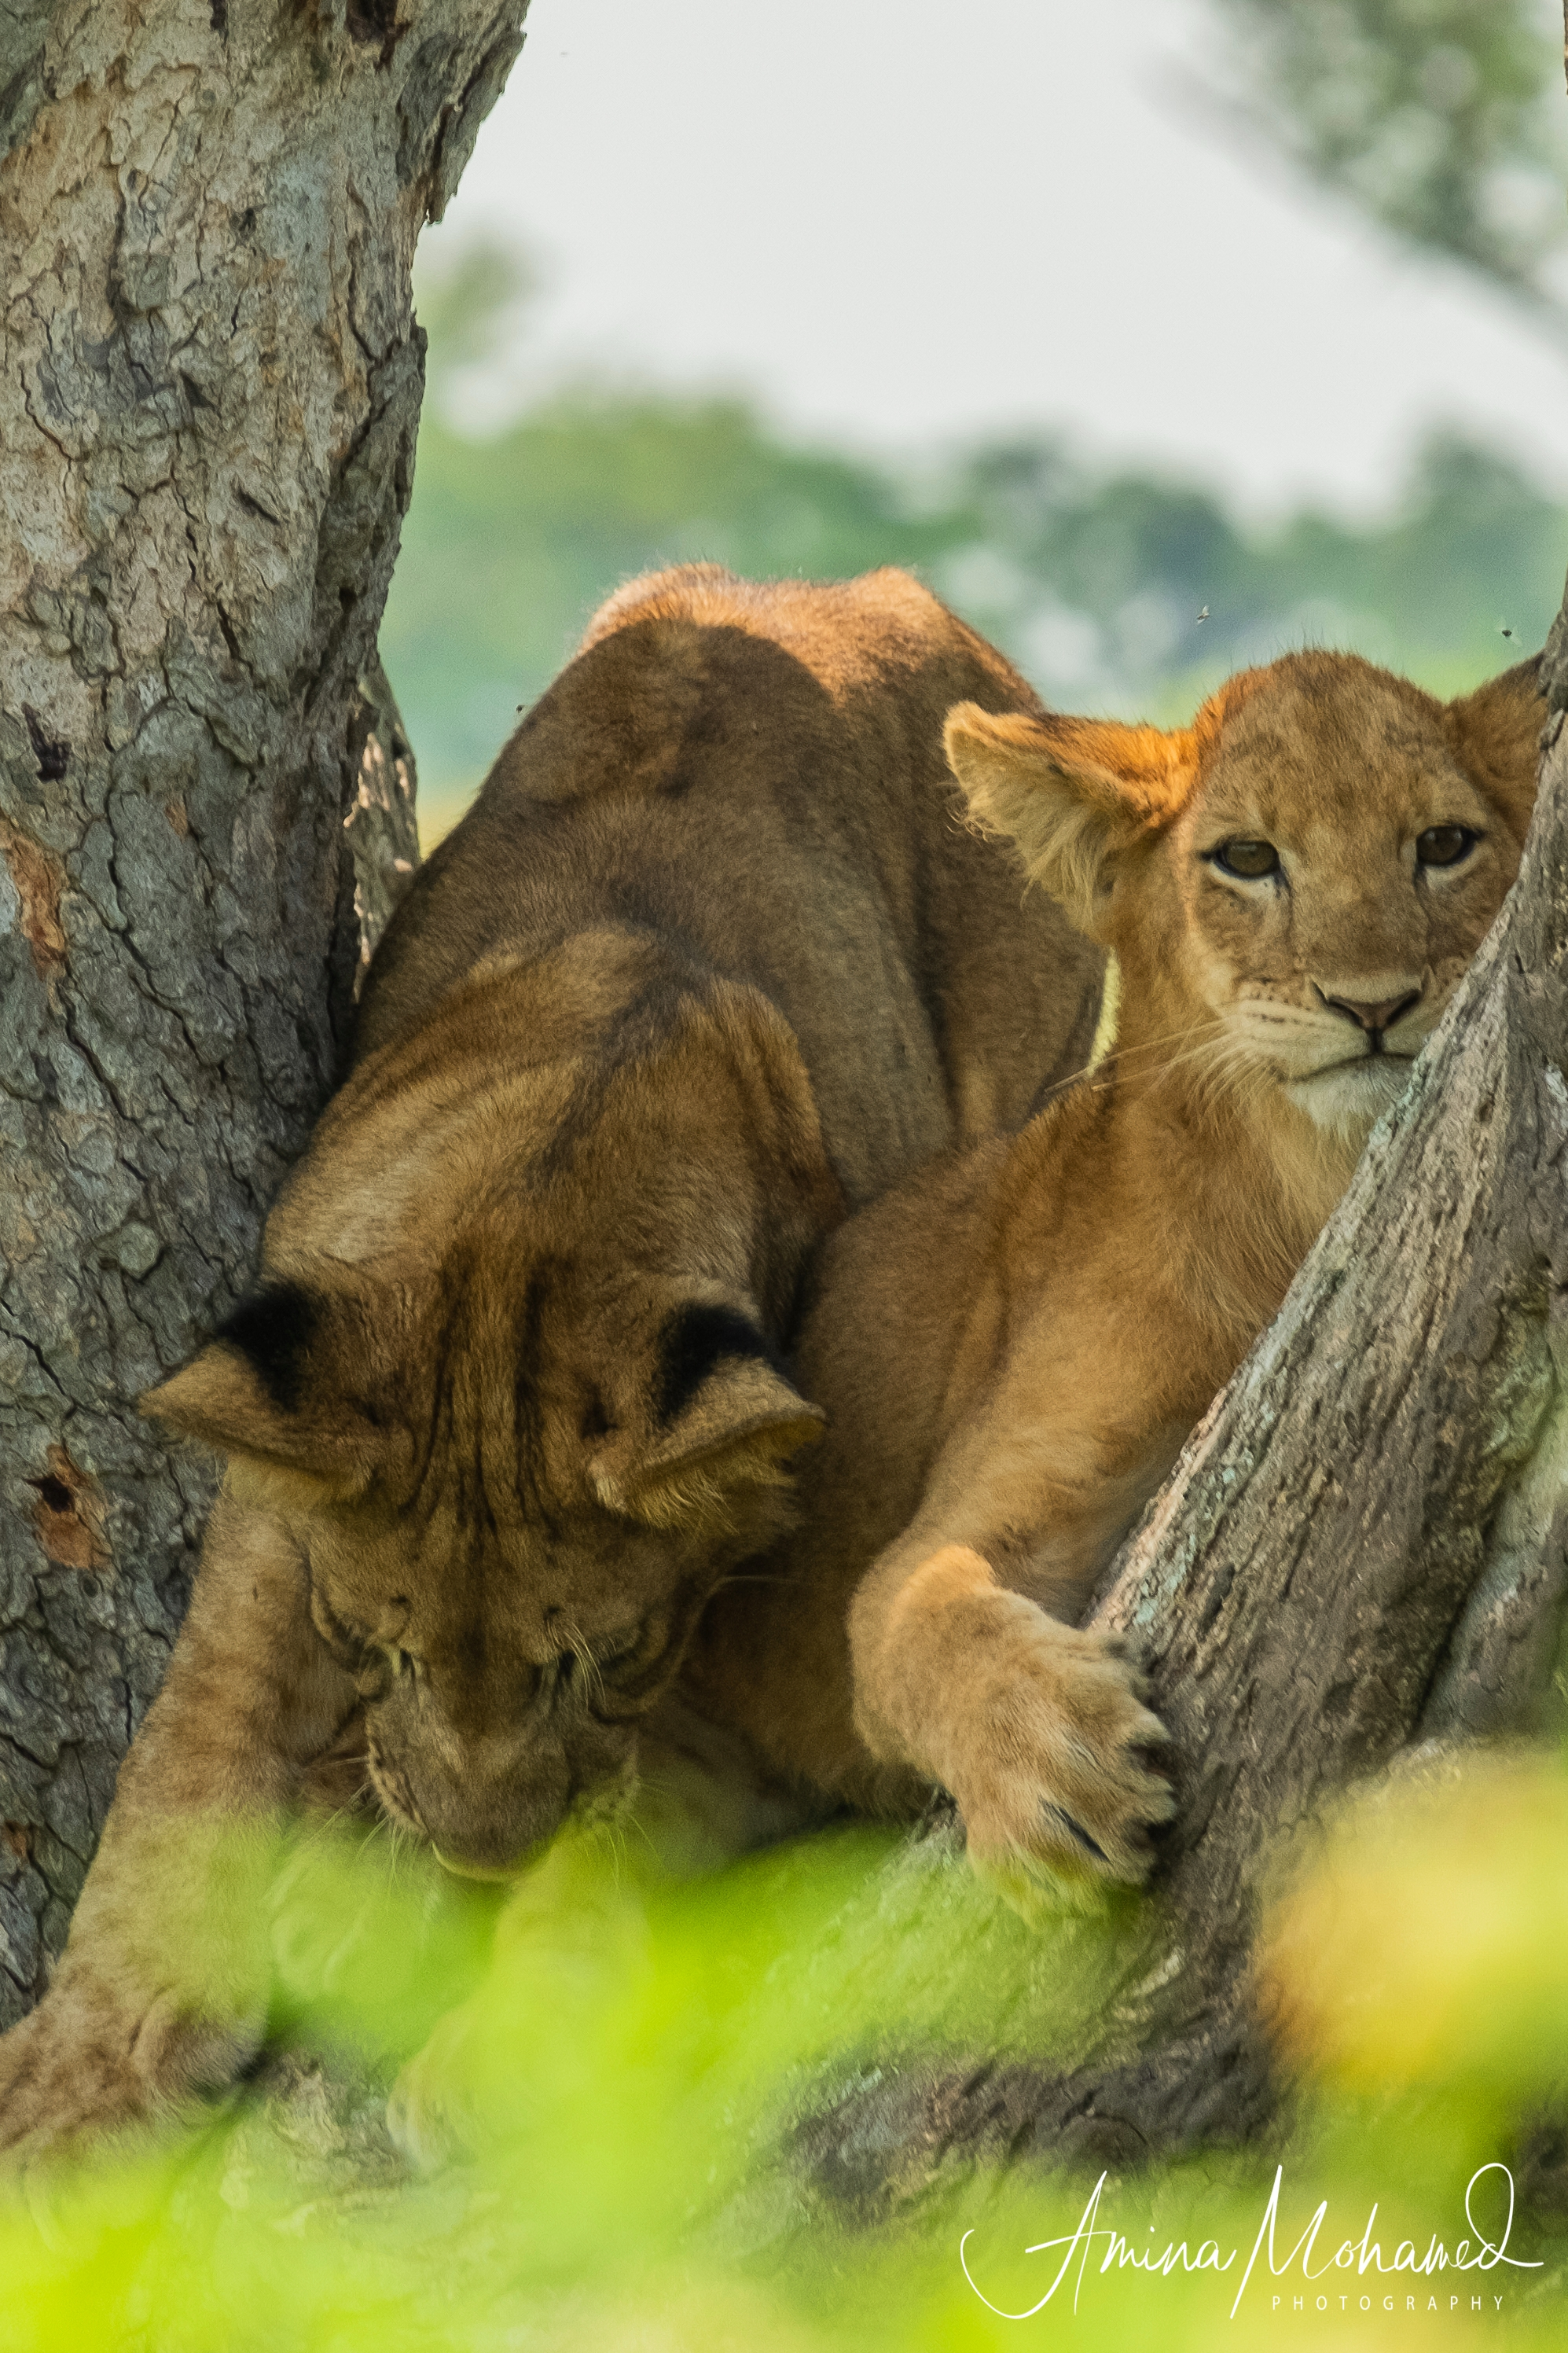 Tree-climbing lions in Queen Elizabeth National Park, Uganda - copyright @ Triple F Photo Tours